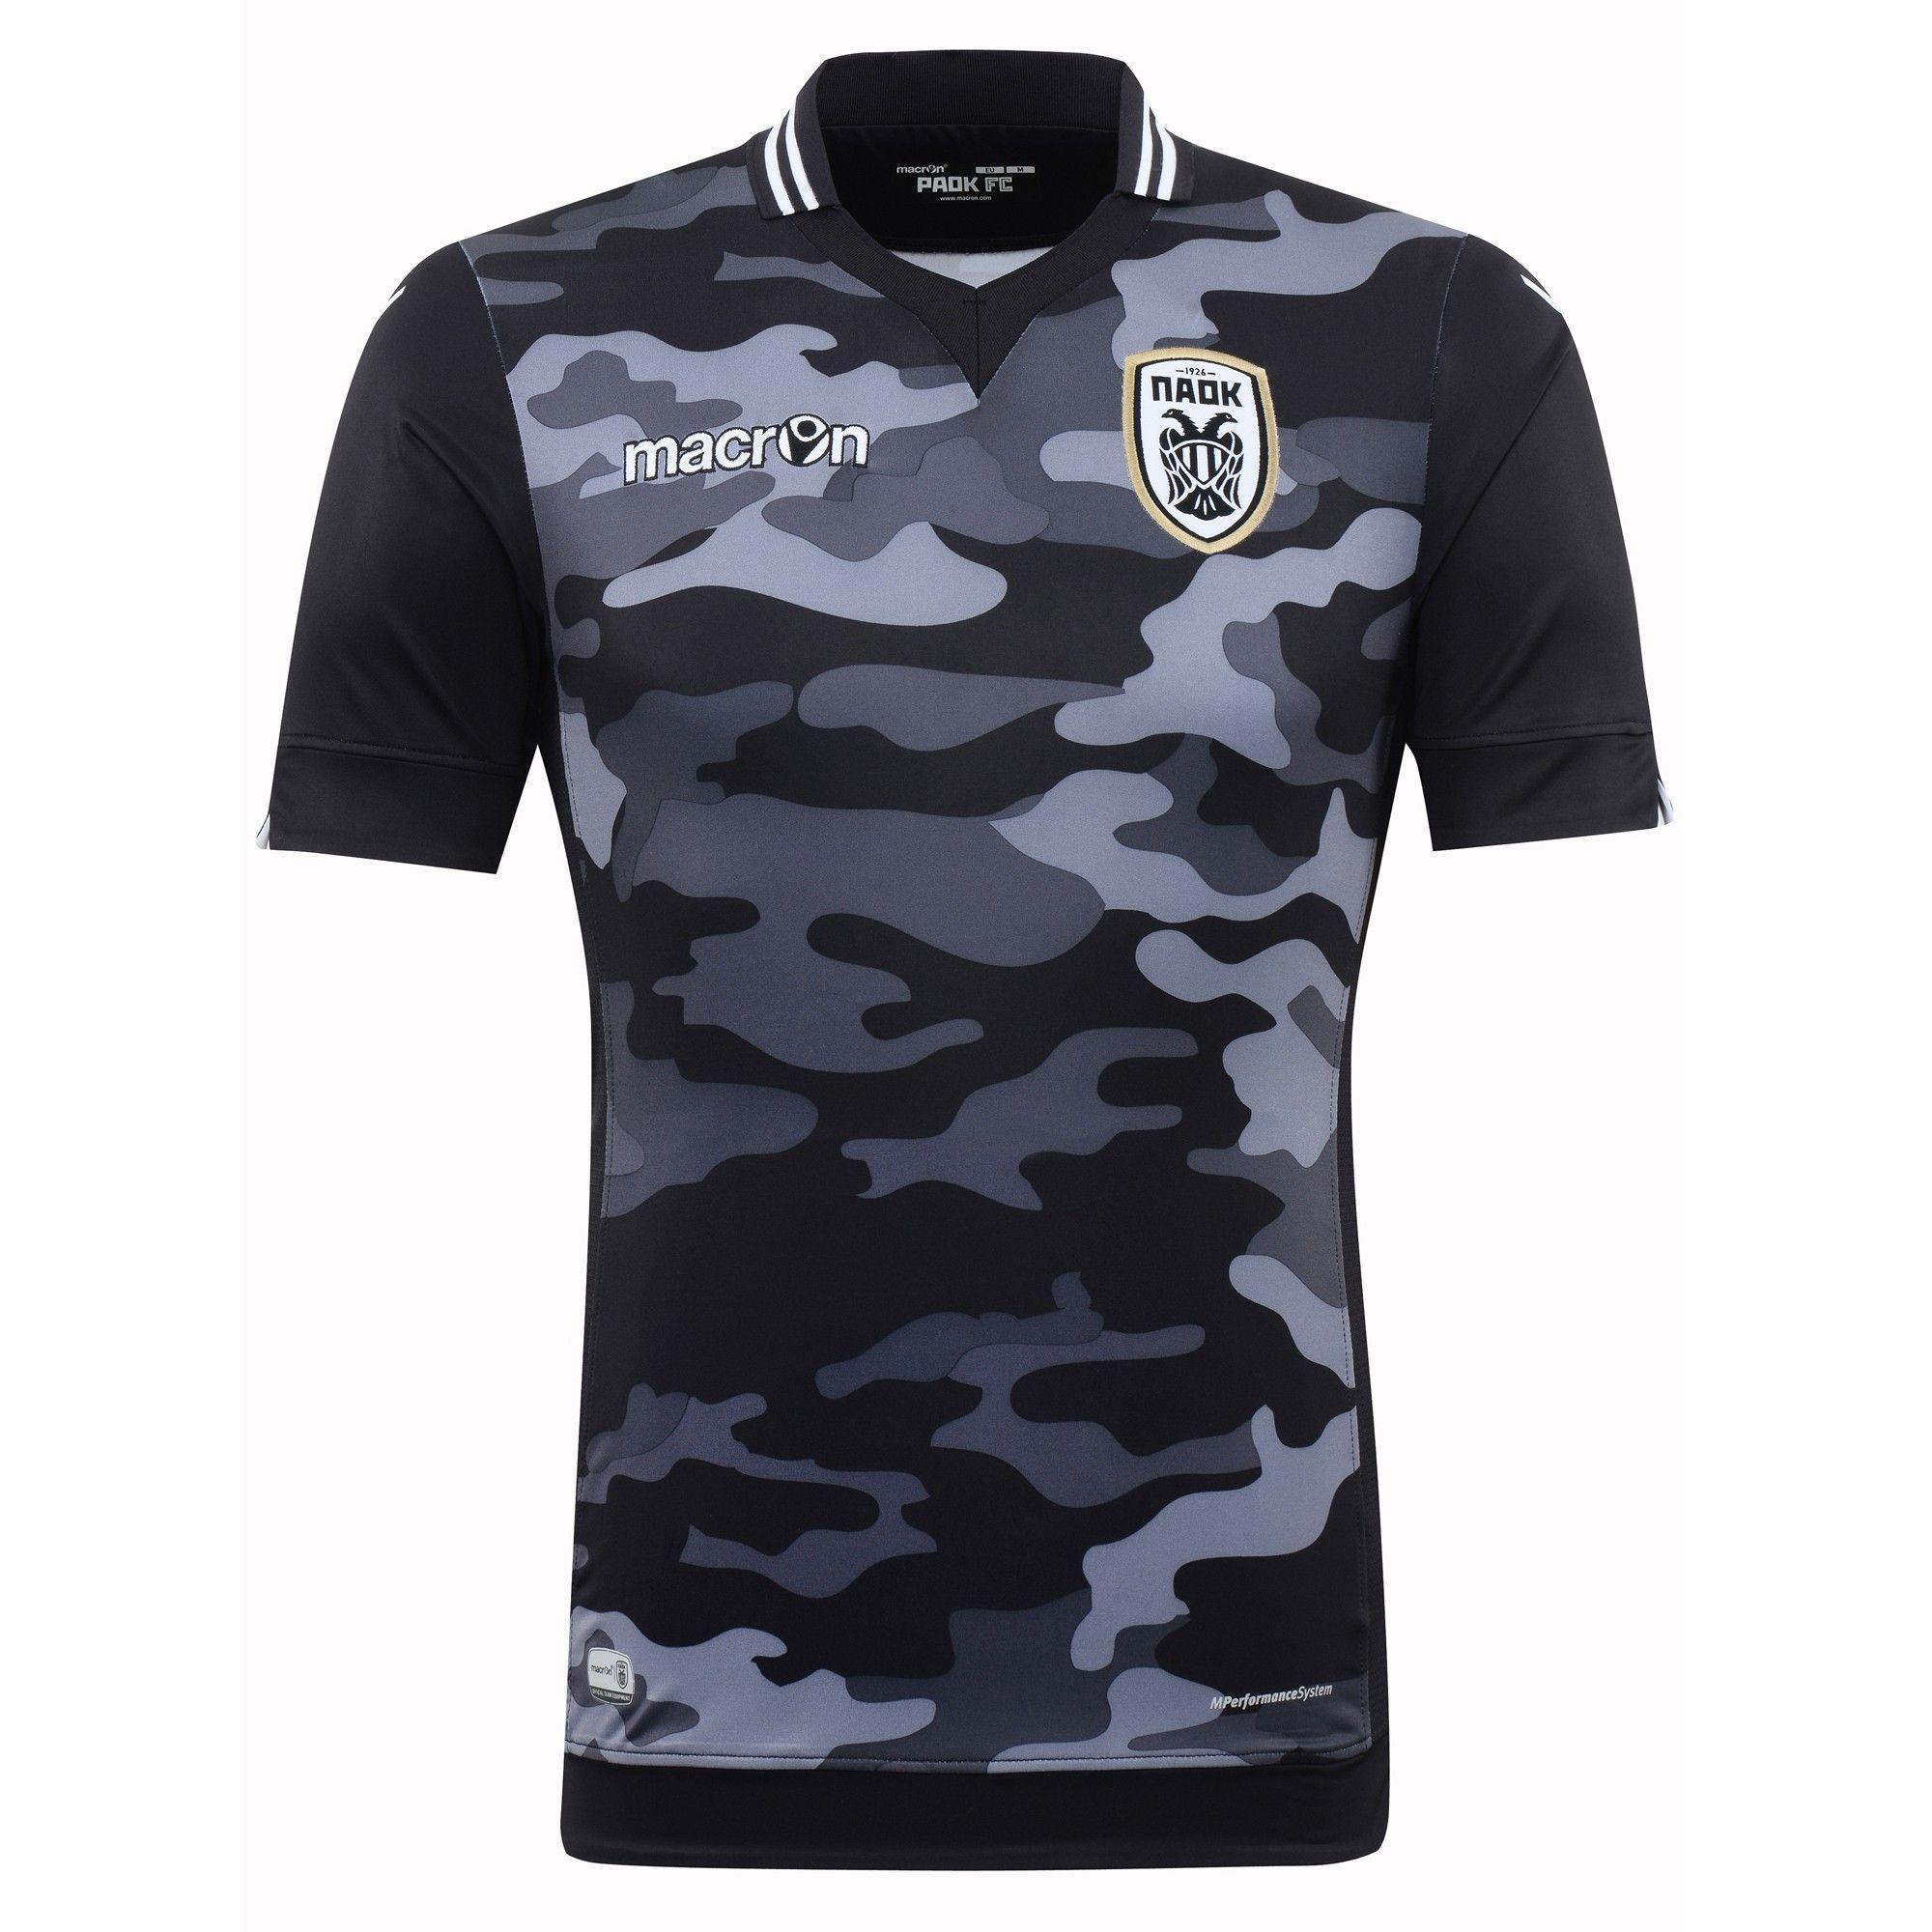 f7097a0b022ac PAOK FC (Greece) - 2015 2016 Macron Third Shirt